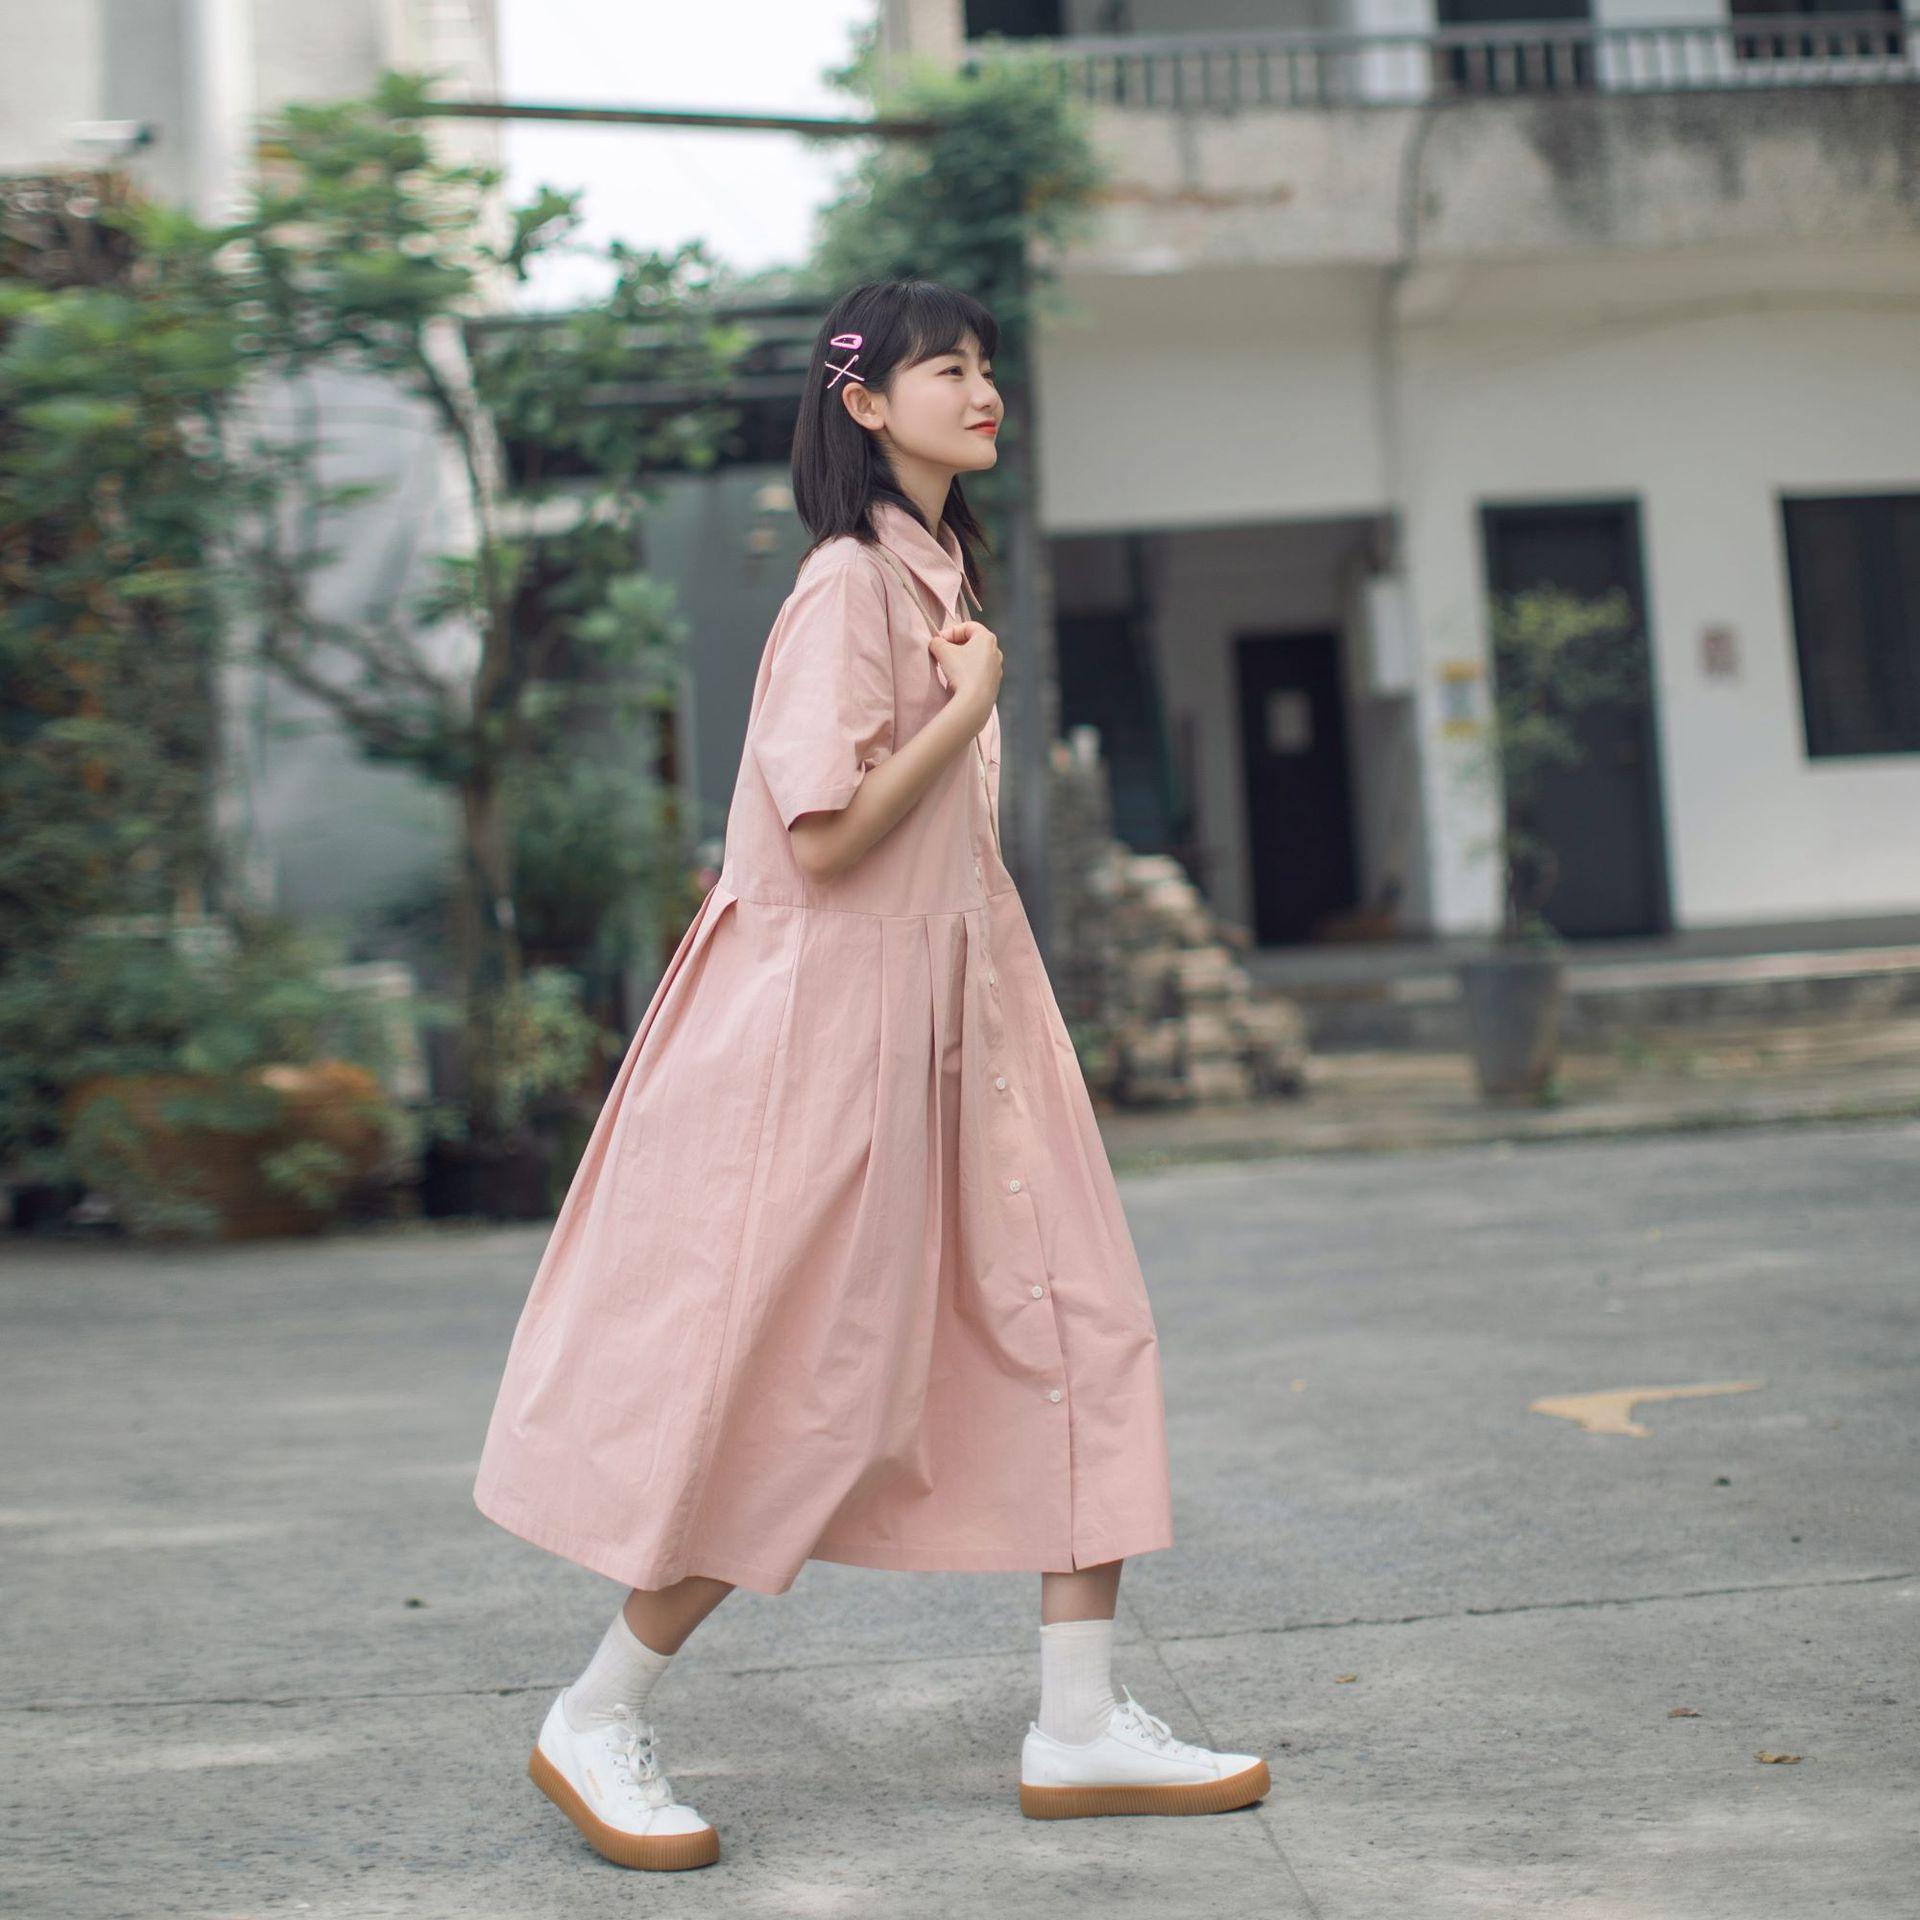 2021 summer fashion Lapel cotton shirt short sleeve dress womens long style slim belly covering skirt long skirt sweet